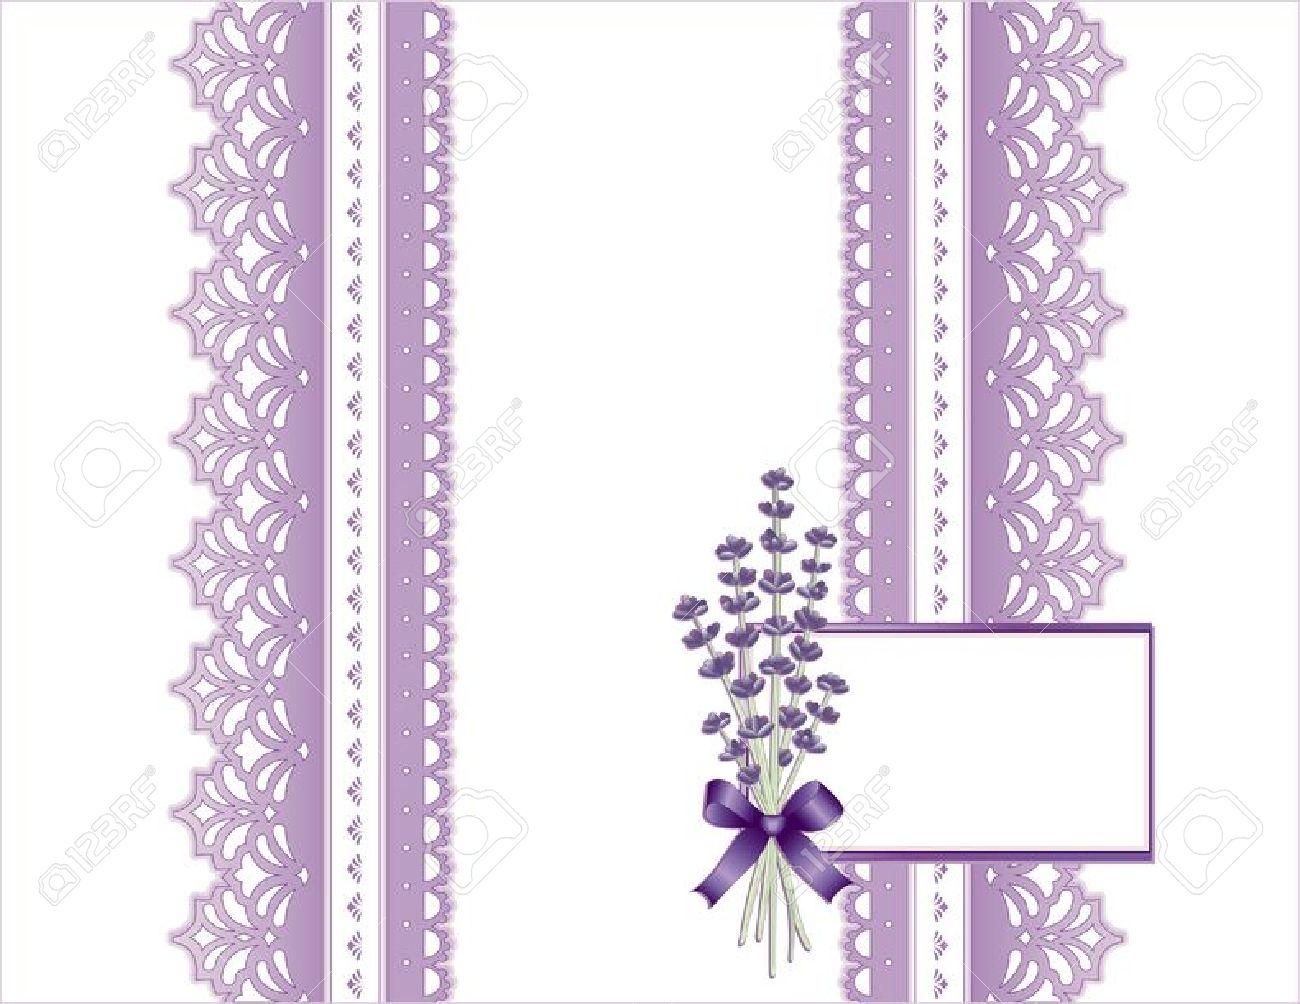 Vintage Lace, Victorian Style, Pastel Violet, Sweet Lavender.